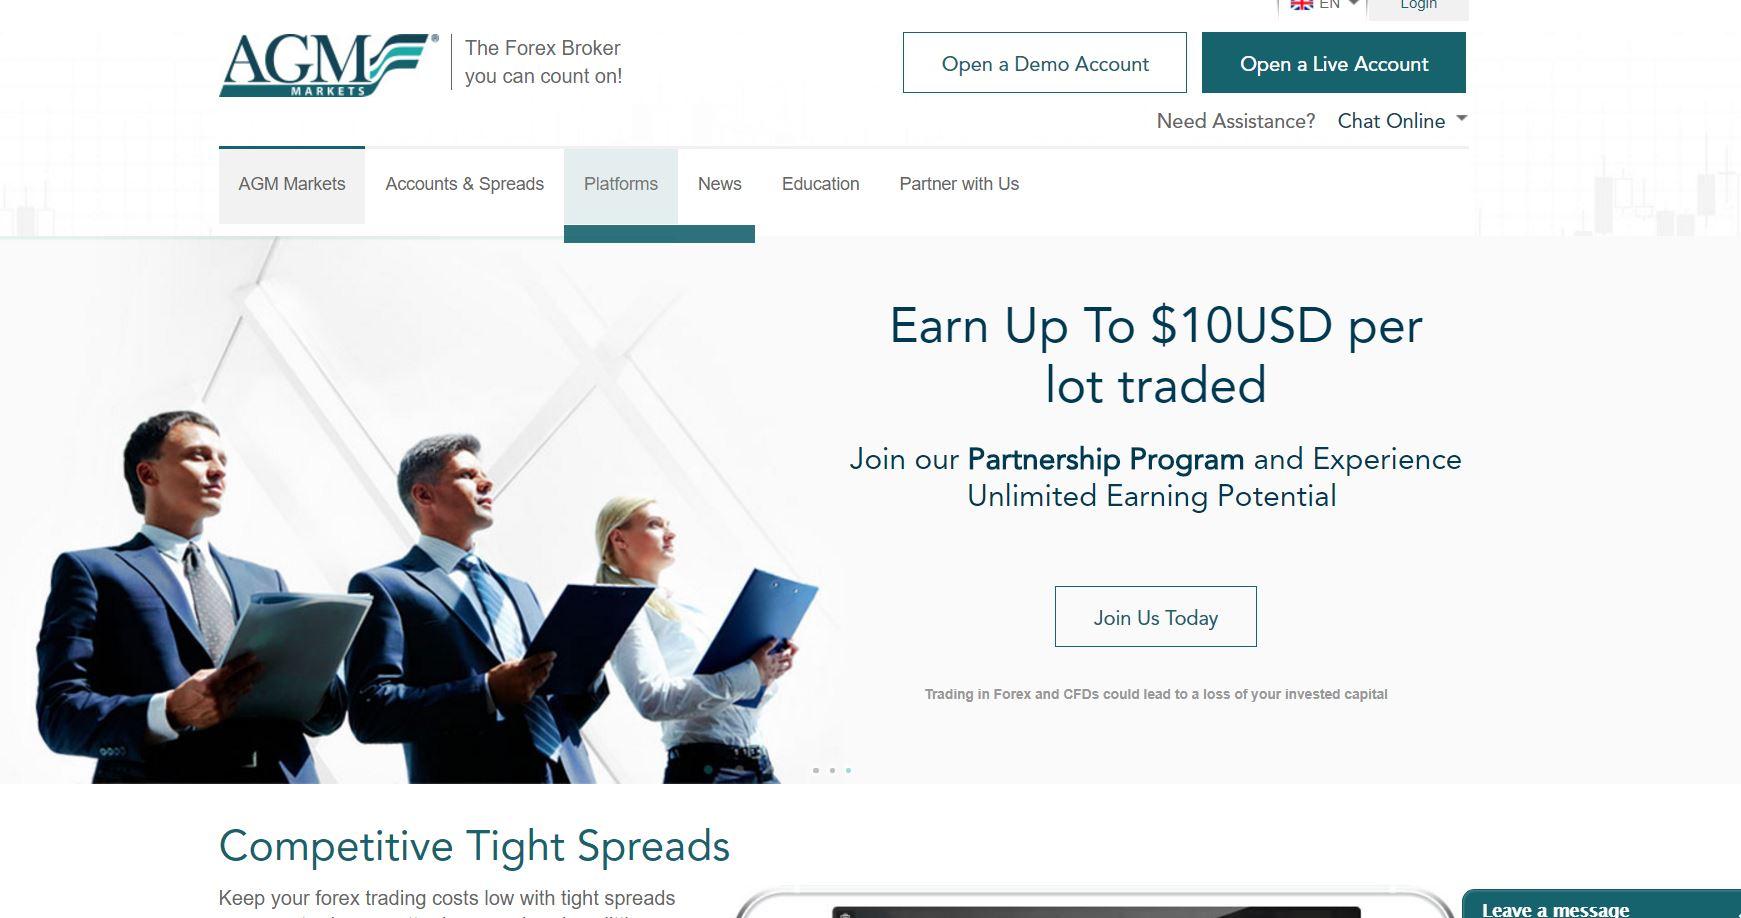 Обзор AGM Markets: типы счетов, бонусы, терминал, спред